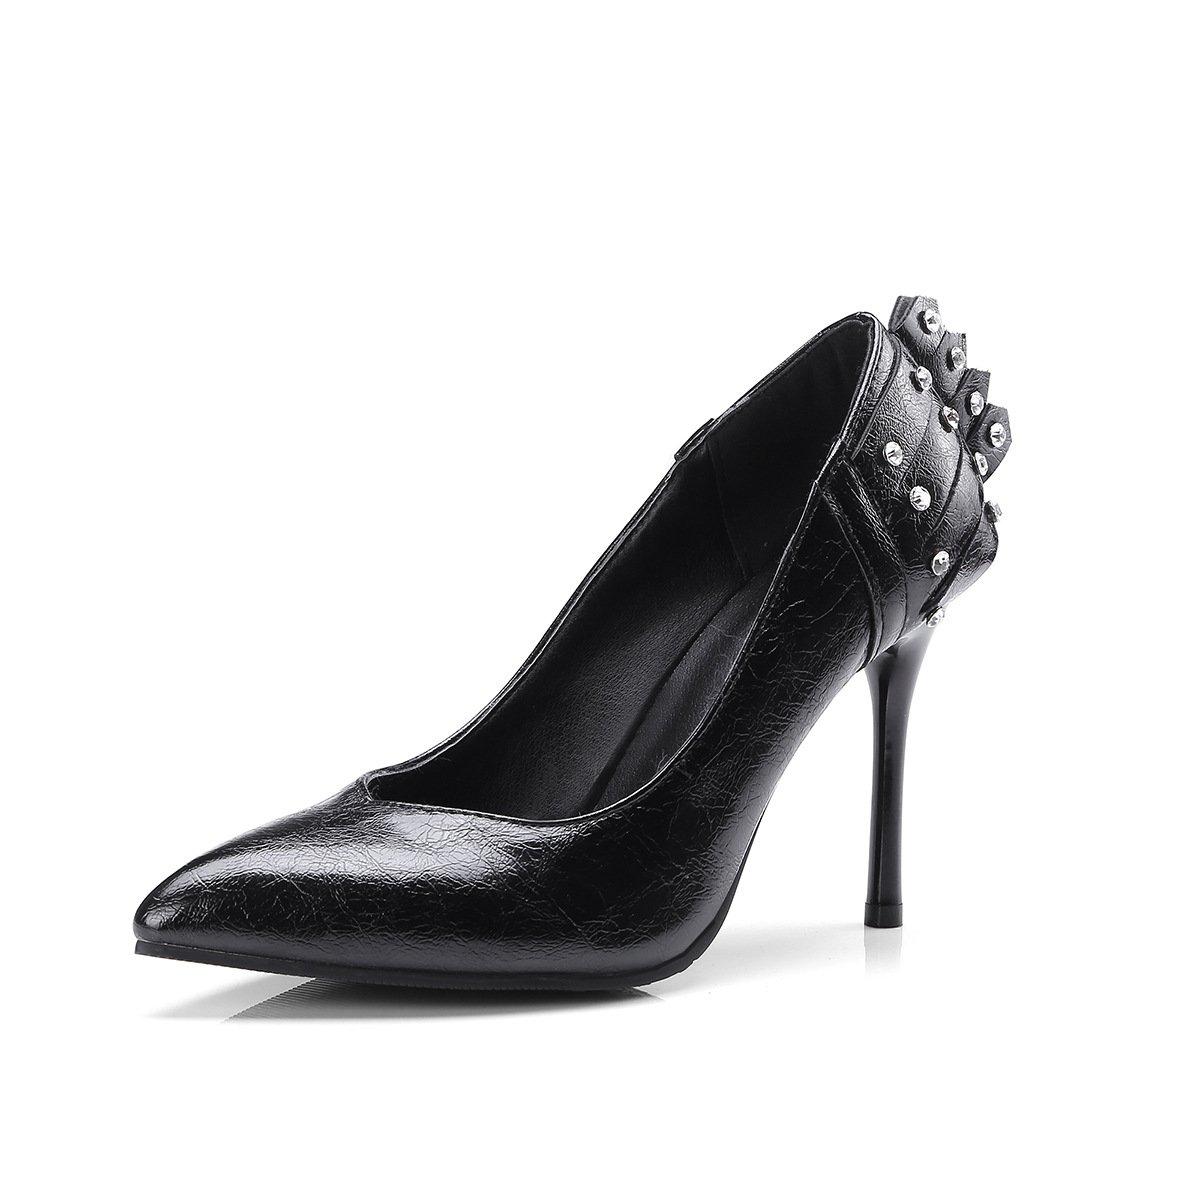 MEI&S Damen Stiletto High Heels Schuhe Flache Mund Schuhe schwarz  schwarz Schuhe 6b5a08